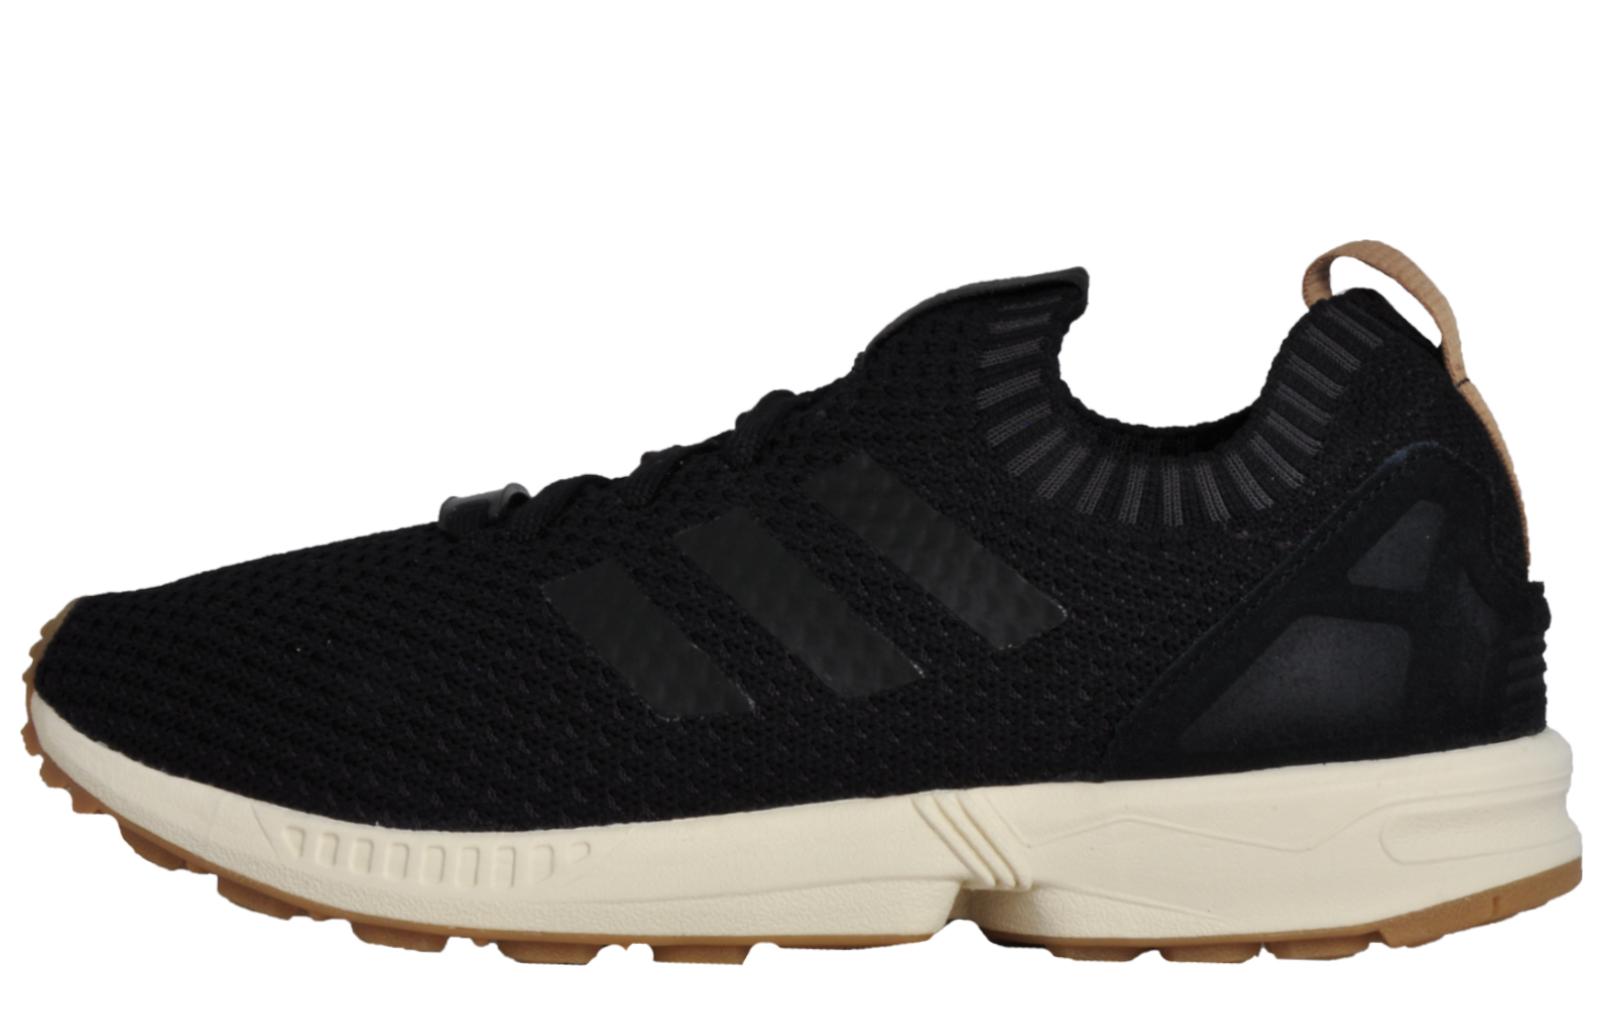 the best attitude cdb01 a97ca Adidas Originals ZX Flux Primeknit Men s Casual Gym Trainers Black